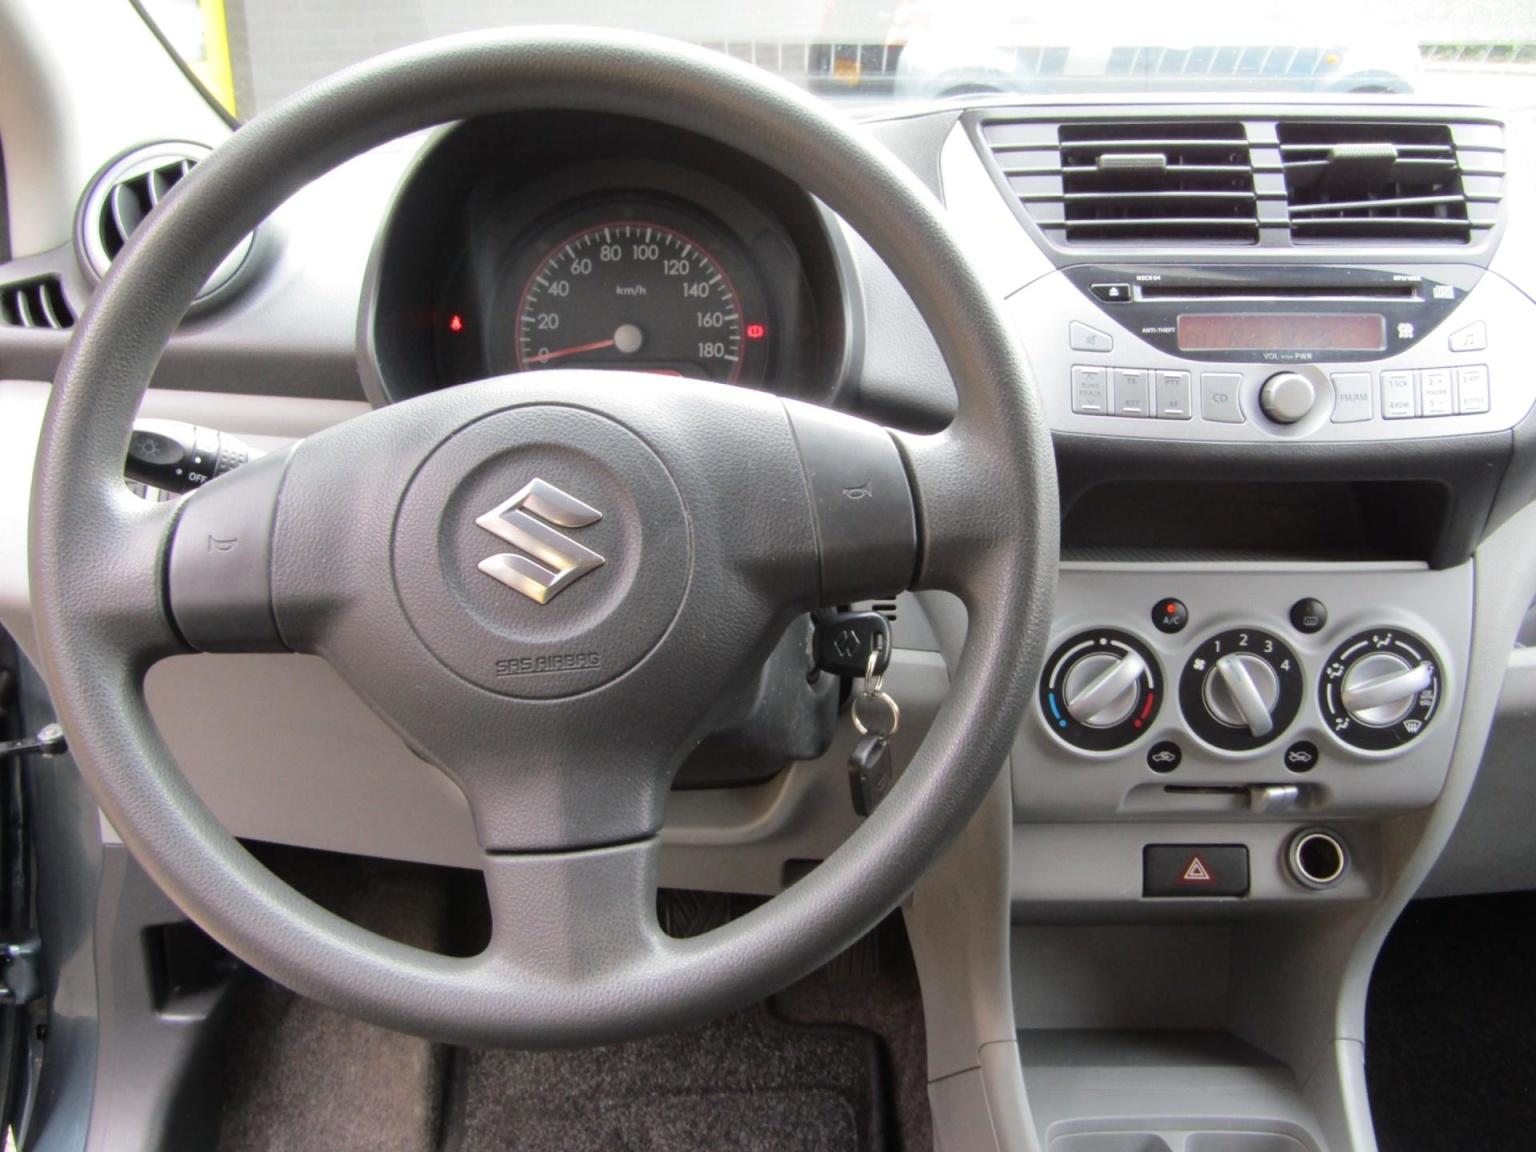 Suzuki-Alto-8